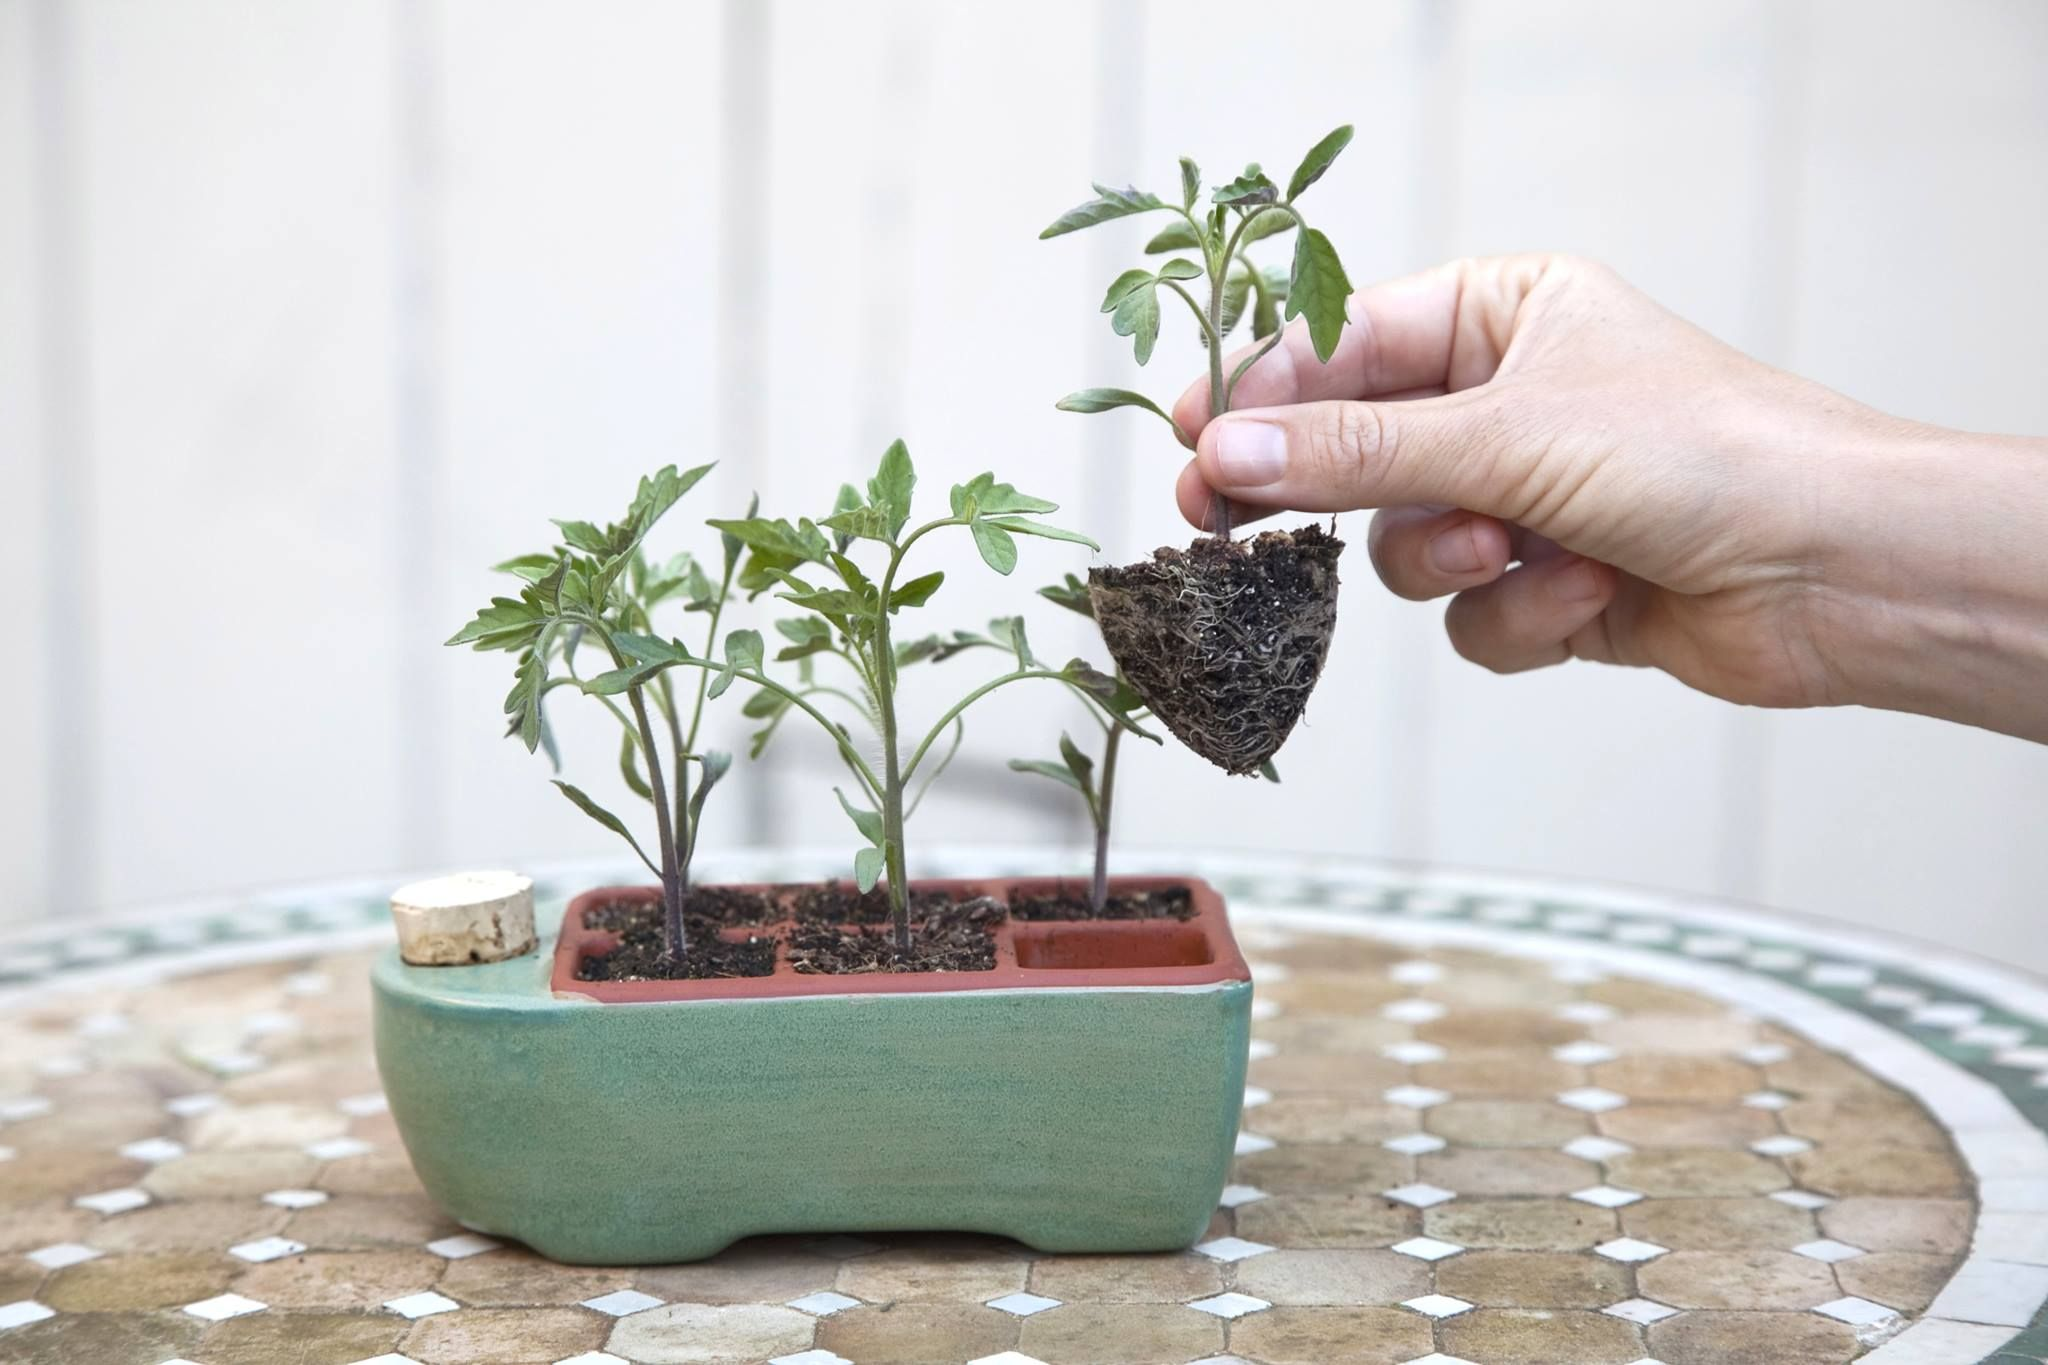 Terra Cotta Self Watering Seed Starter By Orta Kitchen Garden Design Seed Starting Kits Seed Starter Seed Starting